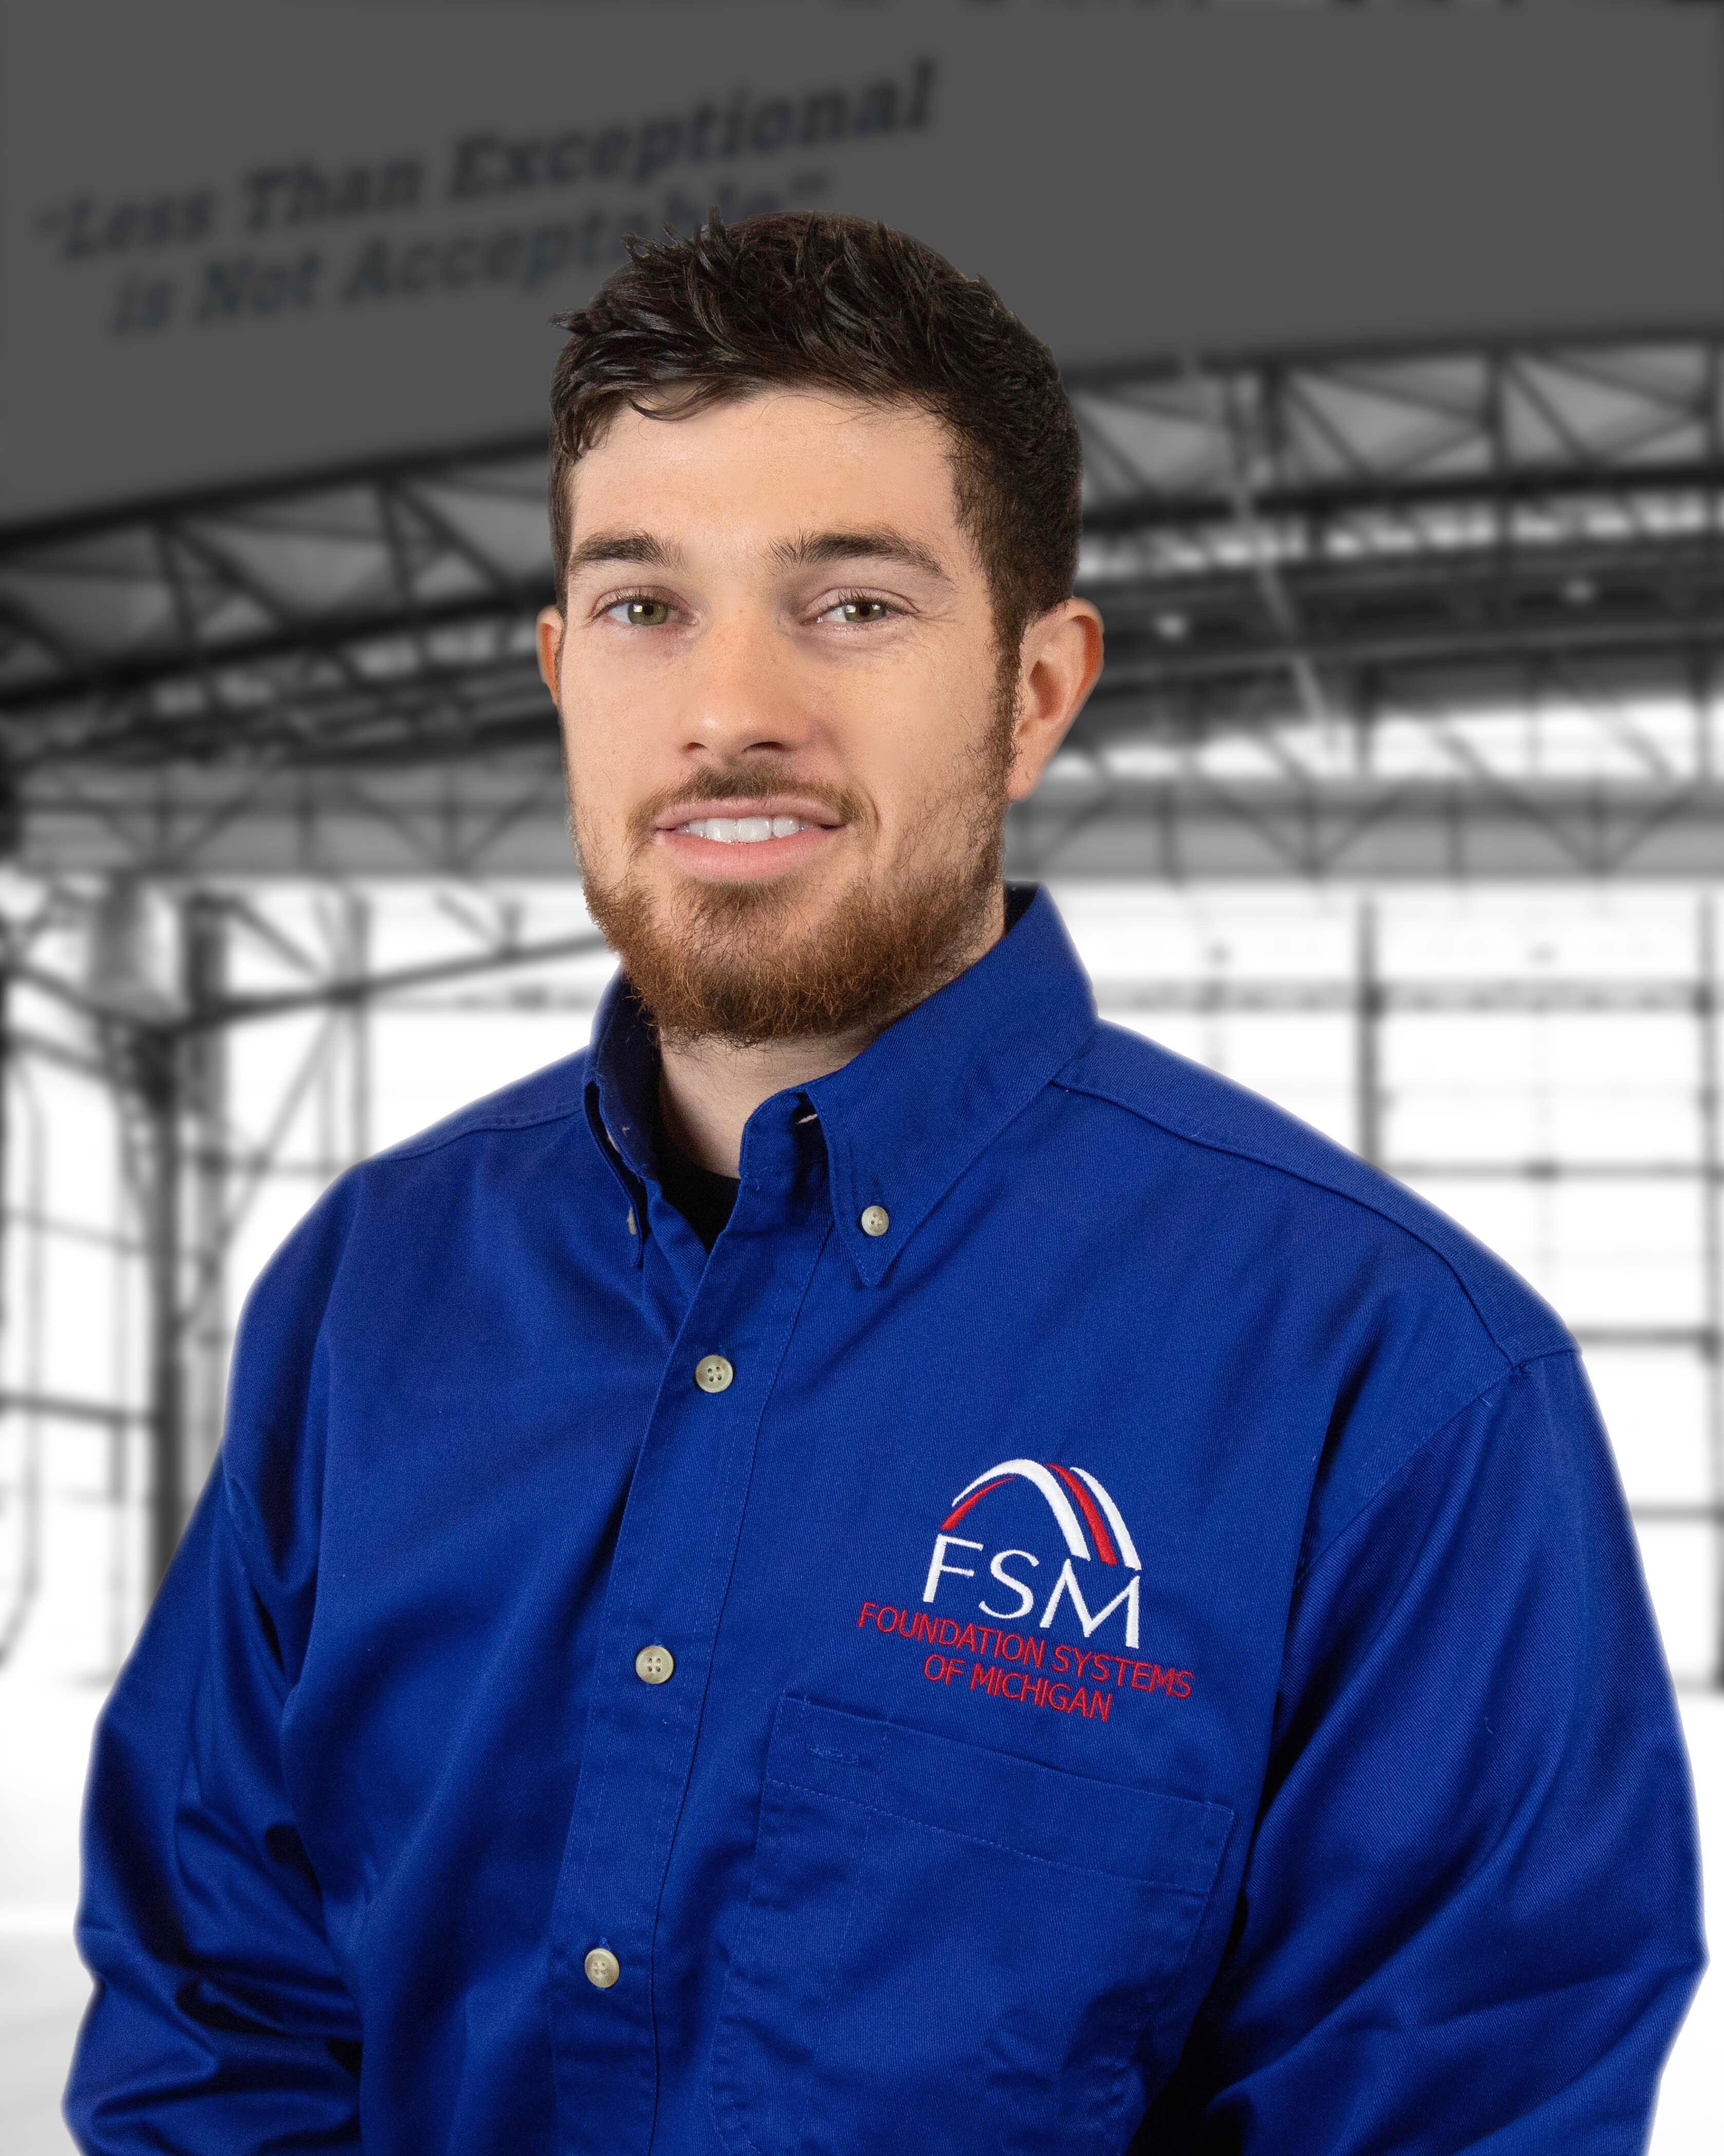 FSM Joseph Gariepy Service Technician